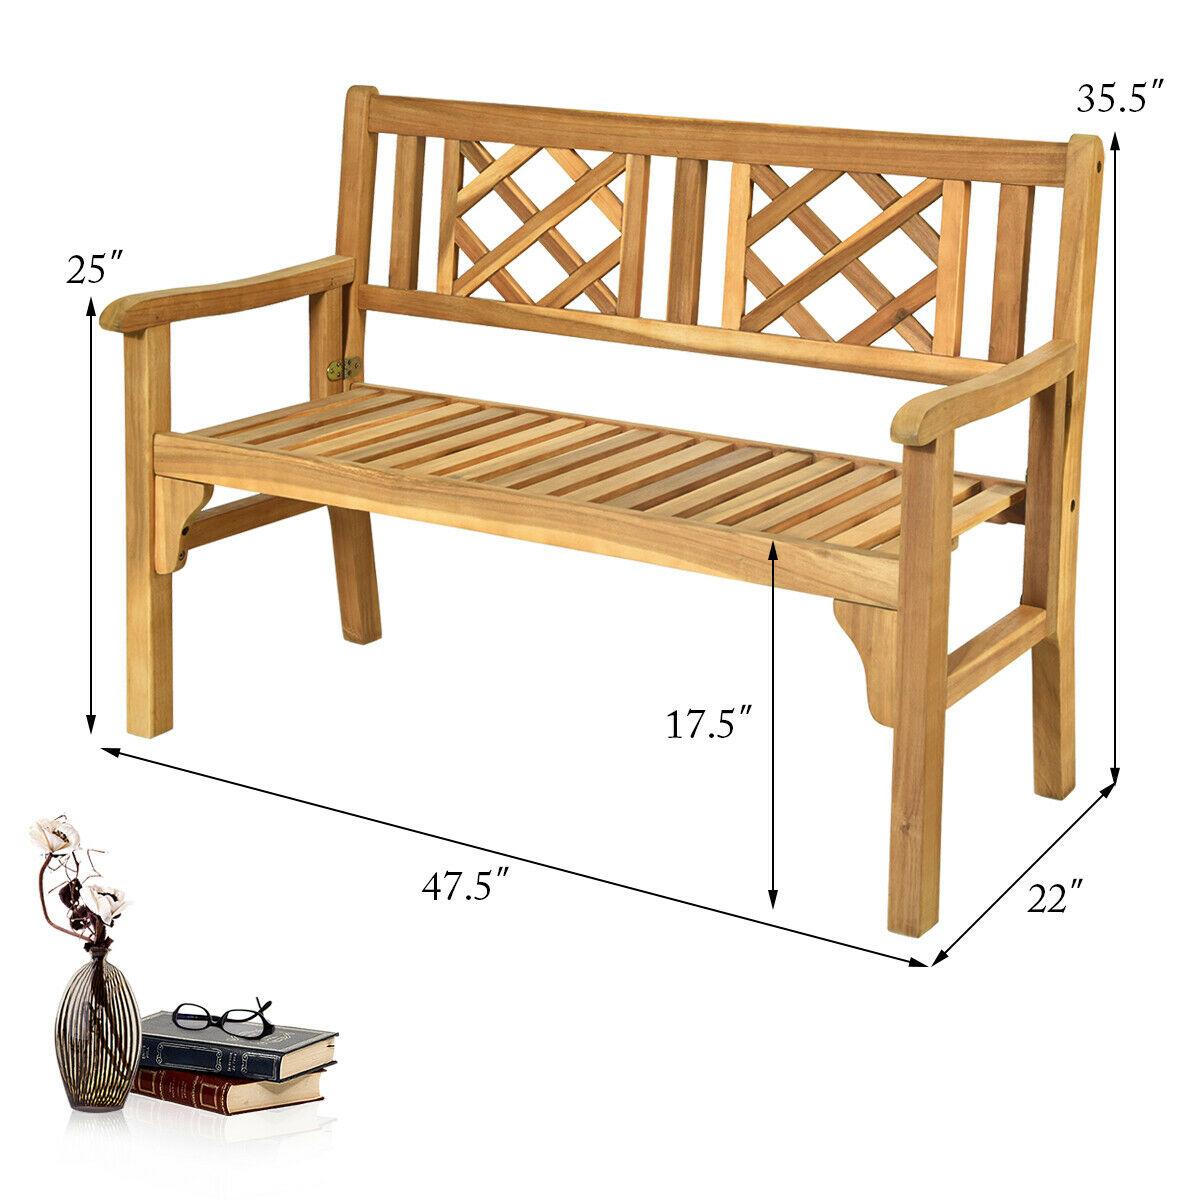 Patio Outdoor Acacia Wood Bench Folding Loveseat Chair Garden Furniture Teak Within Hampstead Heath Teak Garden Benches (View 12 of 25)